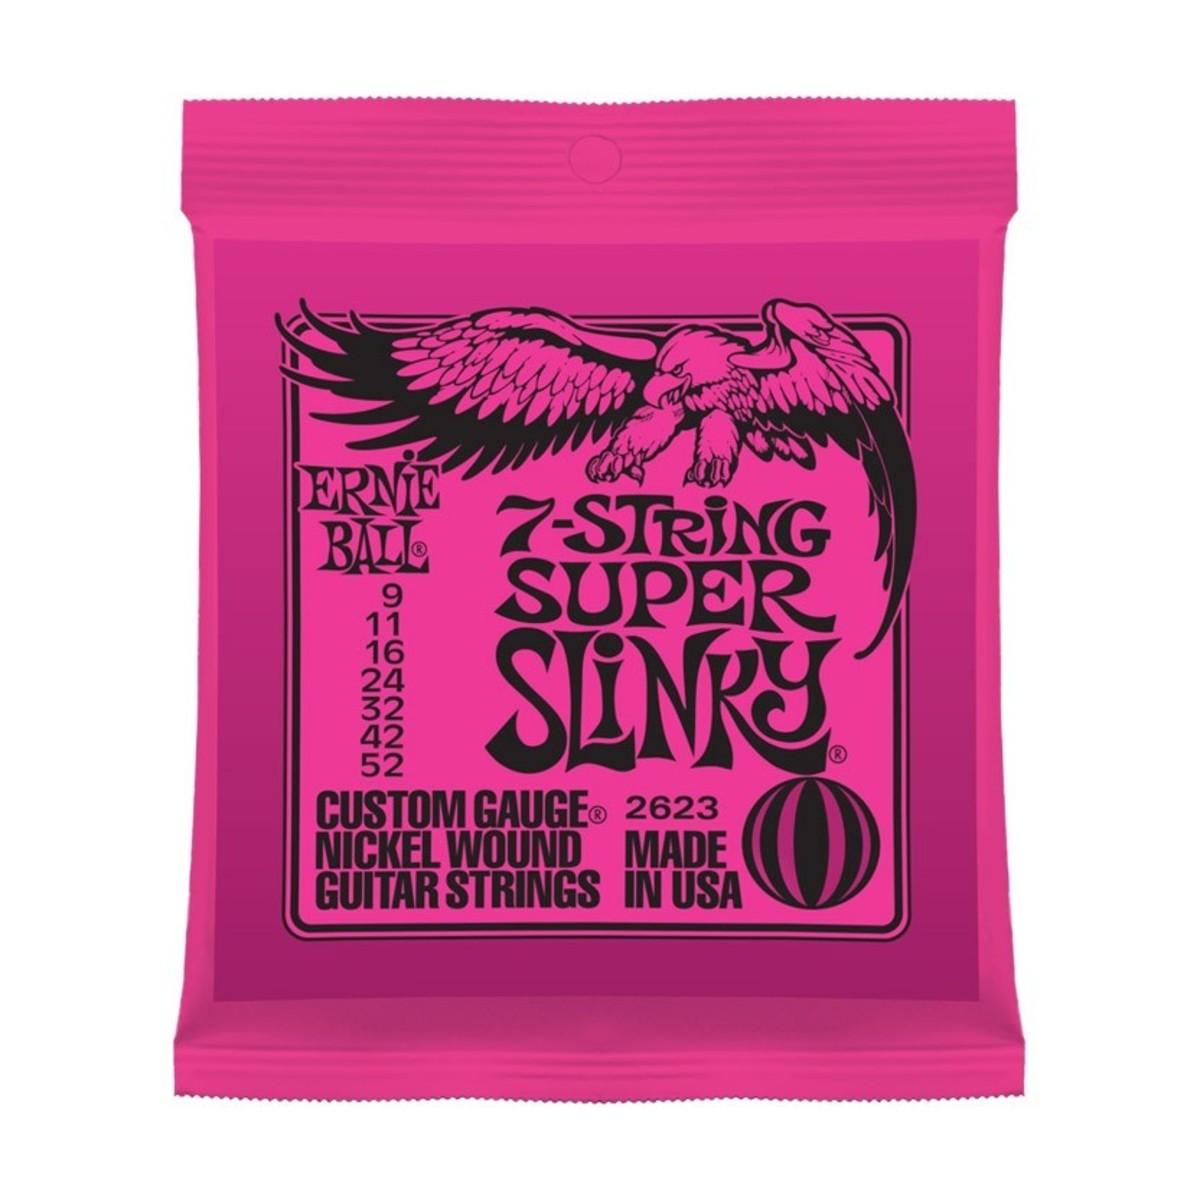 ernie ball super slinky 2623 nickel 7 string 9 52 at gear4music. Black Bedroom Furniture Sets. Home Design Ideas